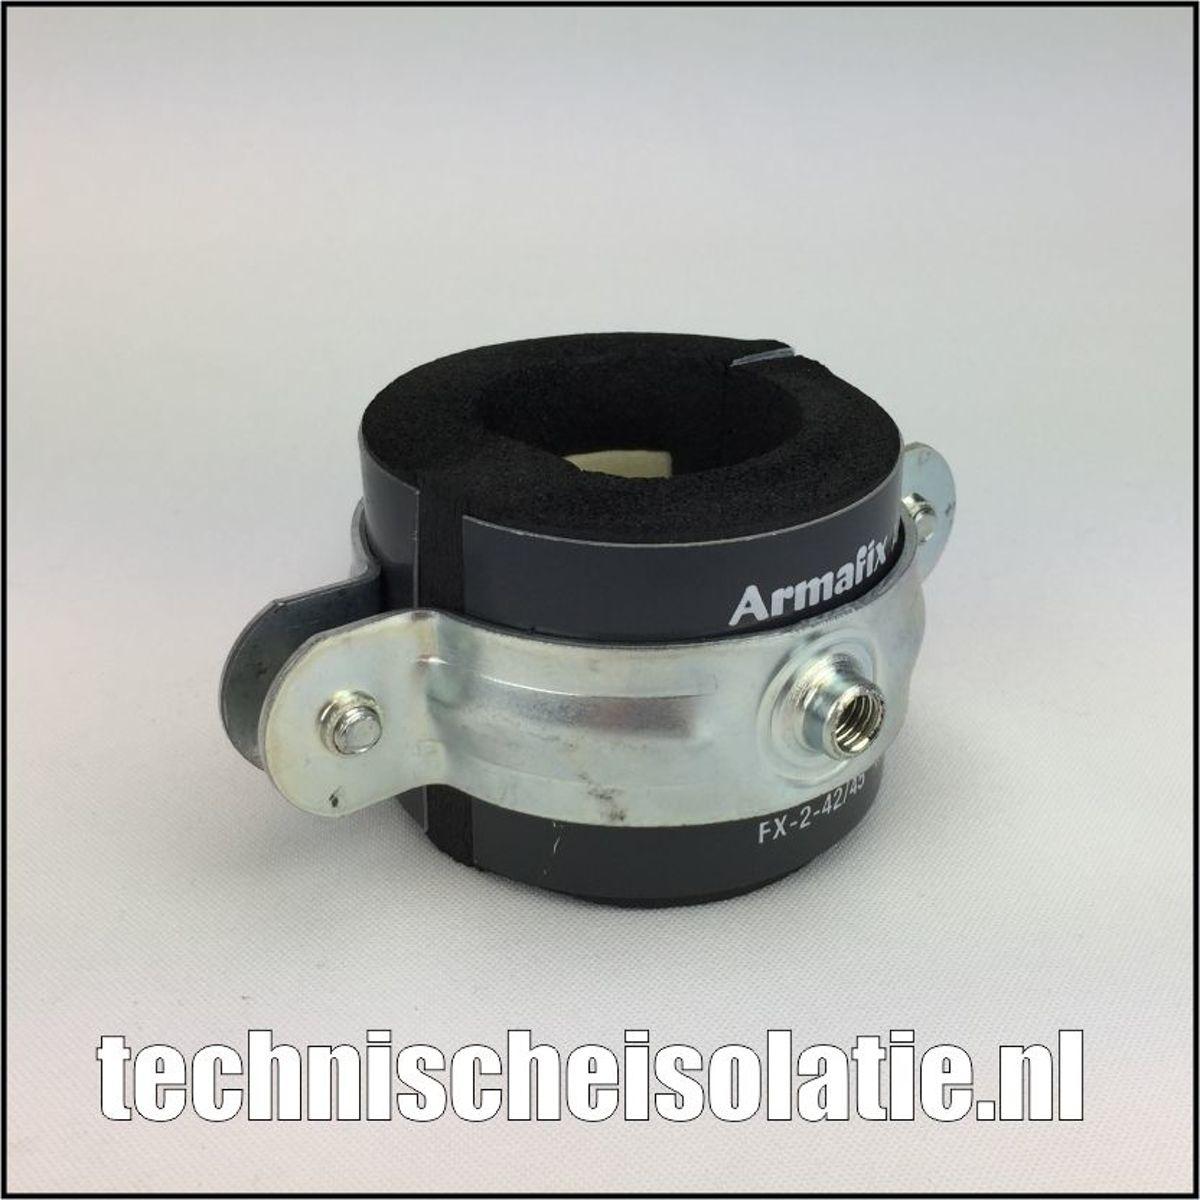 Armafix leidingdragers, type FX-2-048K - 5 sets kopen